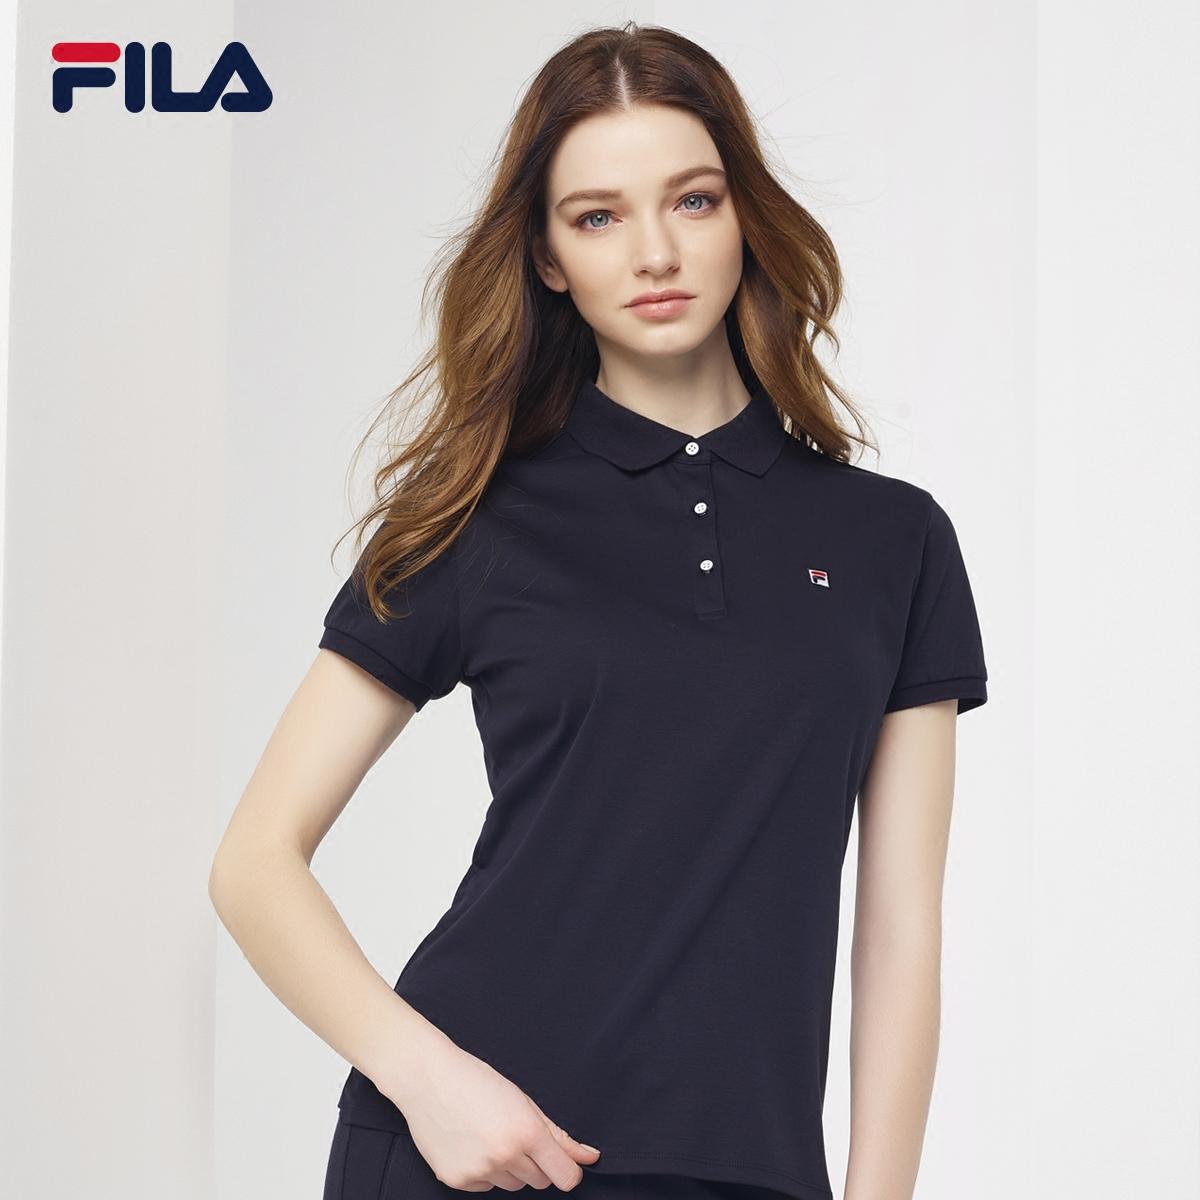 FILA斐乐T恤女2018夏季新款POLO衫纯棉短袖上衣运动T恤女